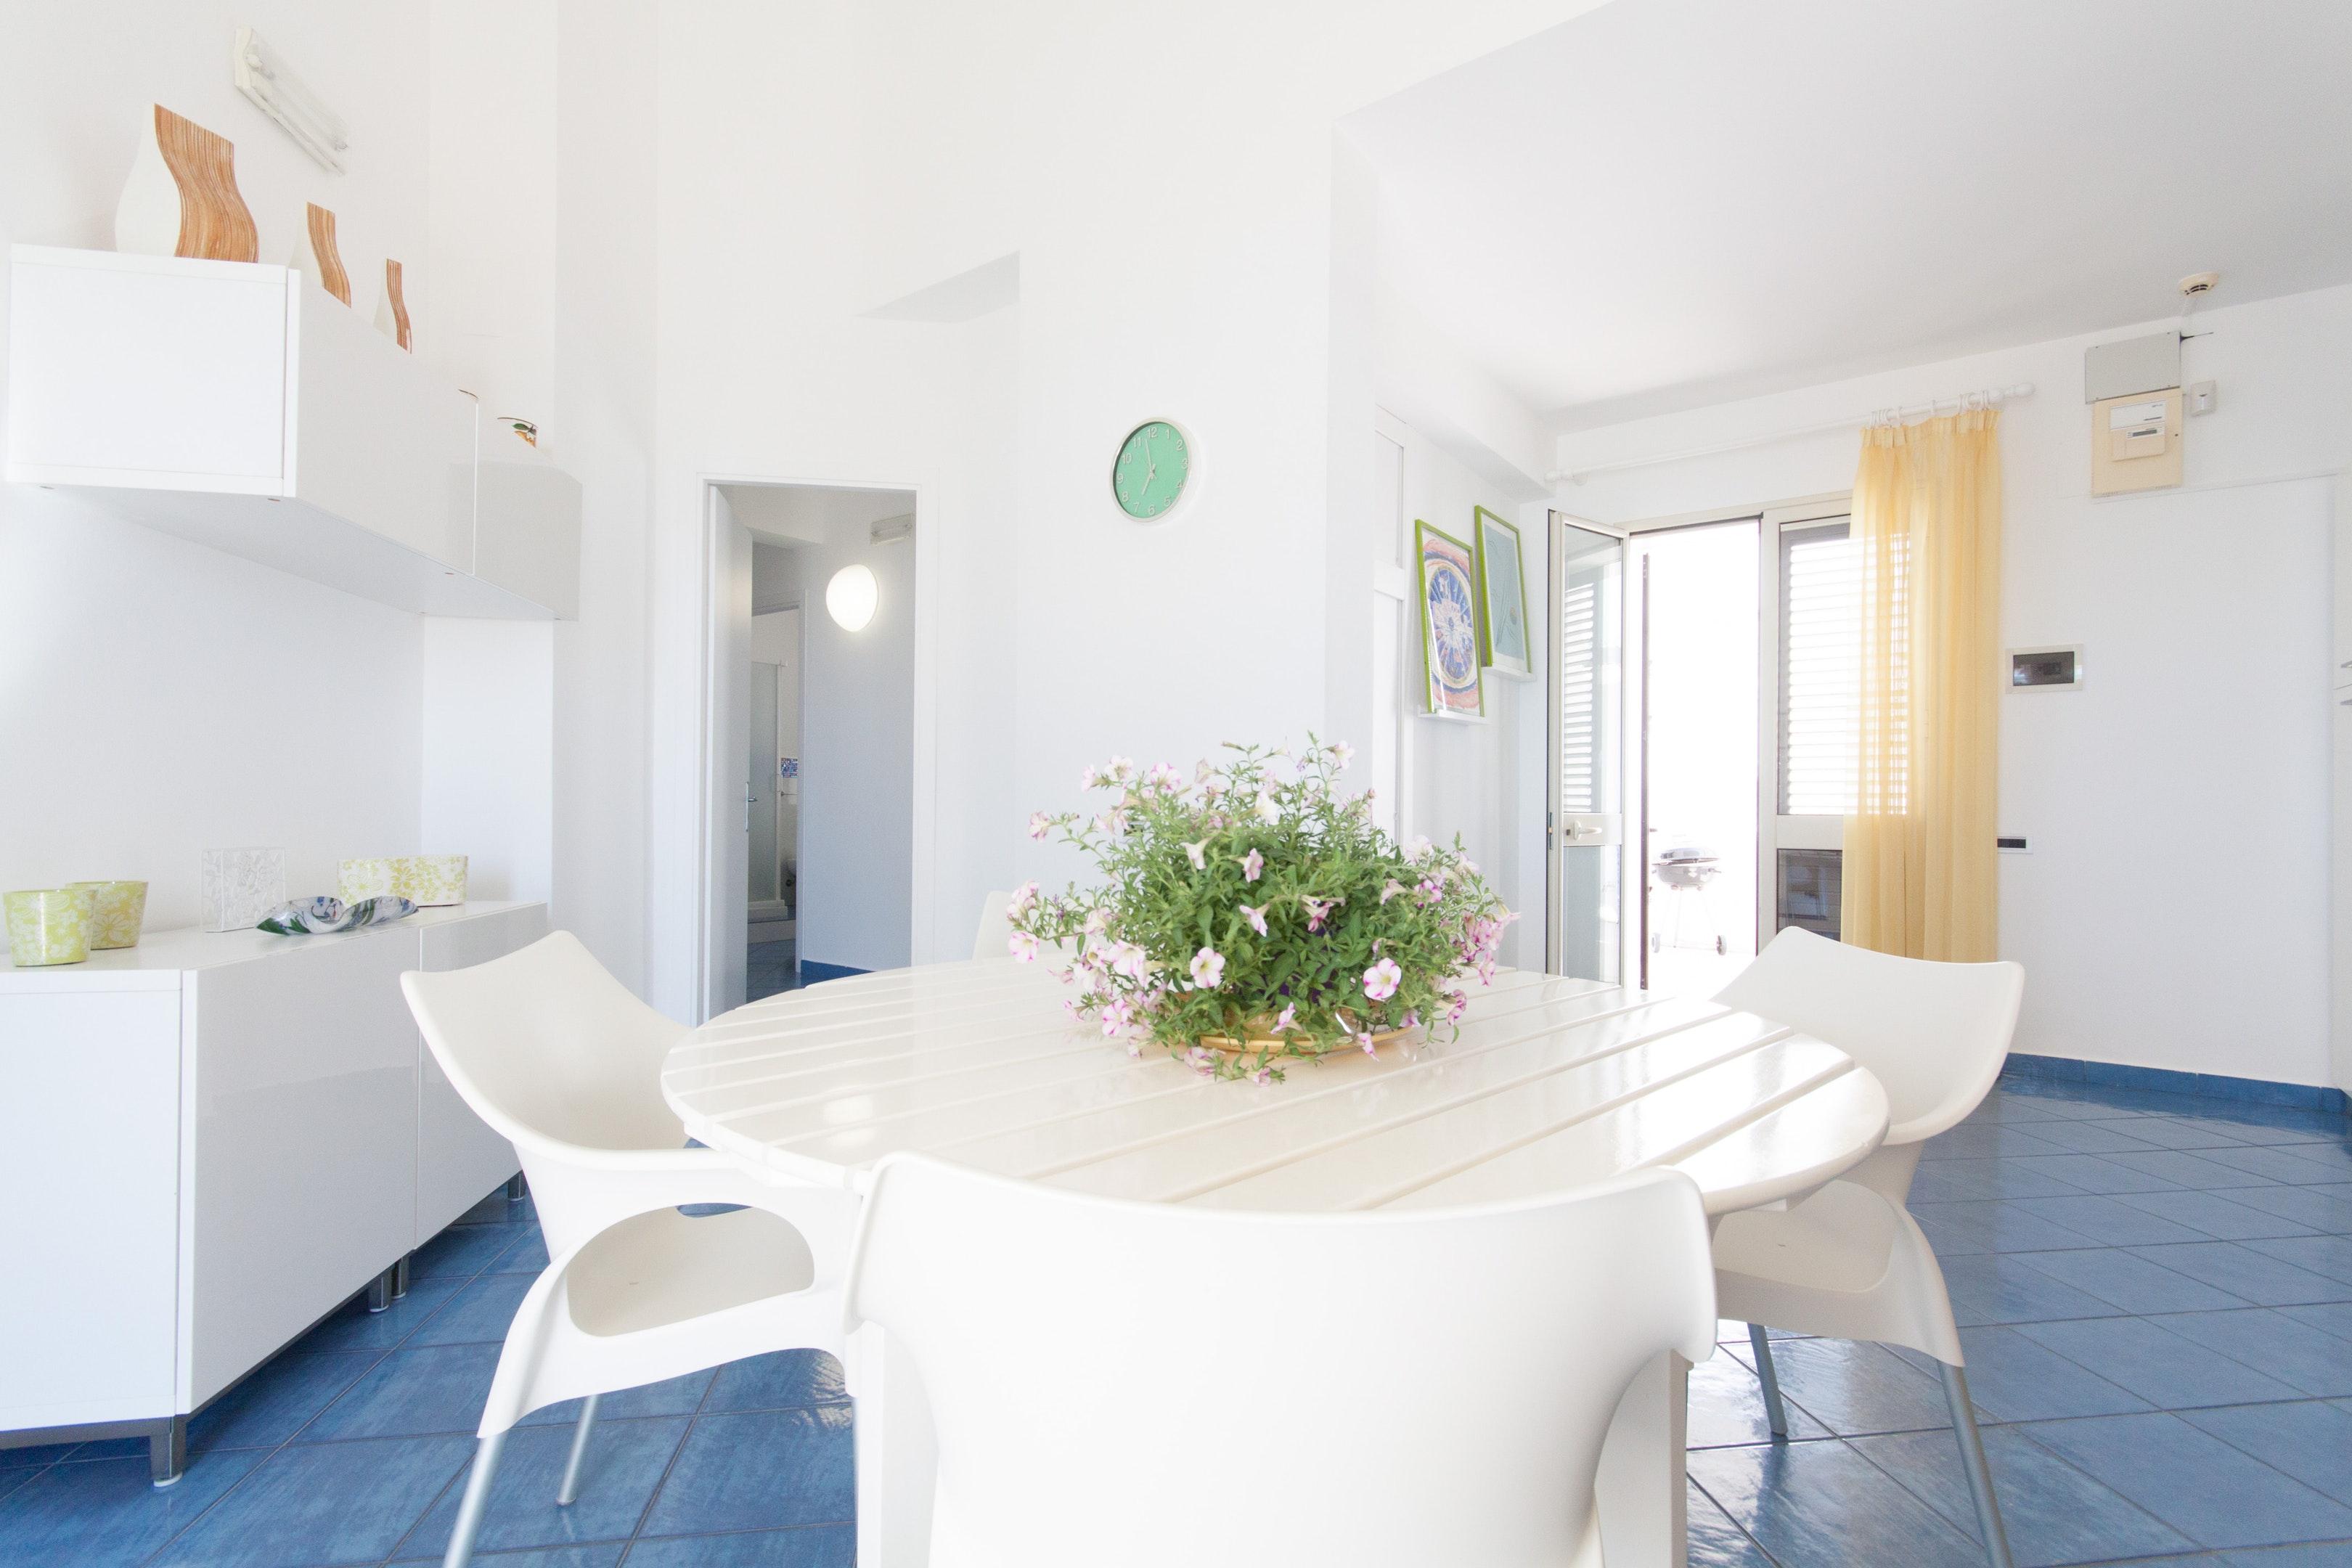 Holiday apartment Wohnung mit 3 Schlafzimmern in Piano di Trappeto mit herrlichem Meerblick, möblierter Terr (2271436), Balestrate, Palermo, Sicily, Italy, picture 12